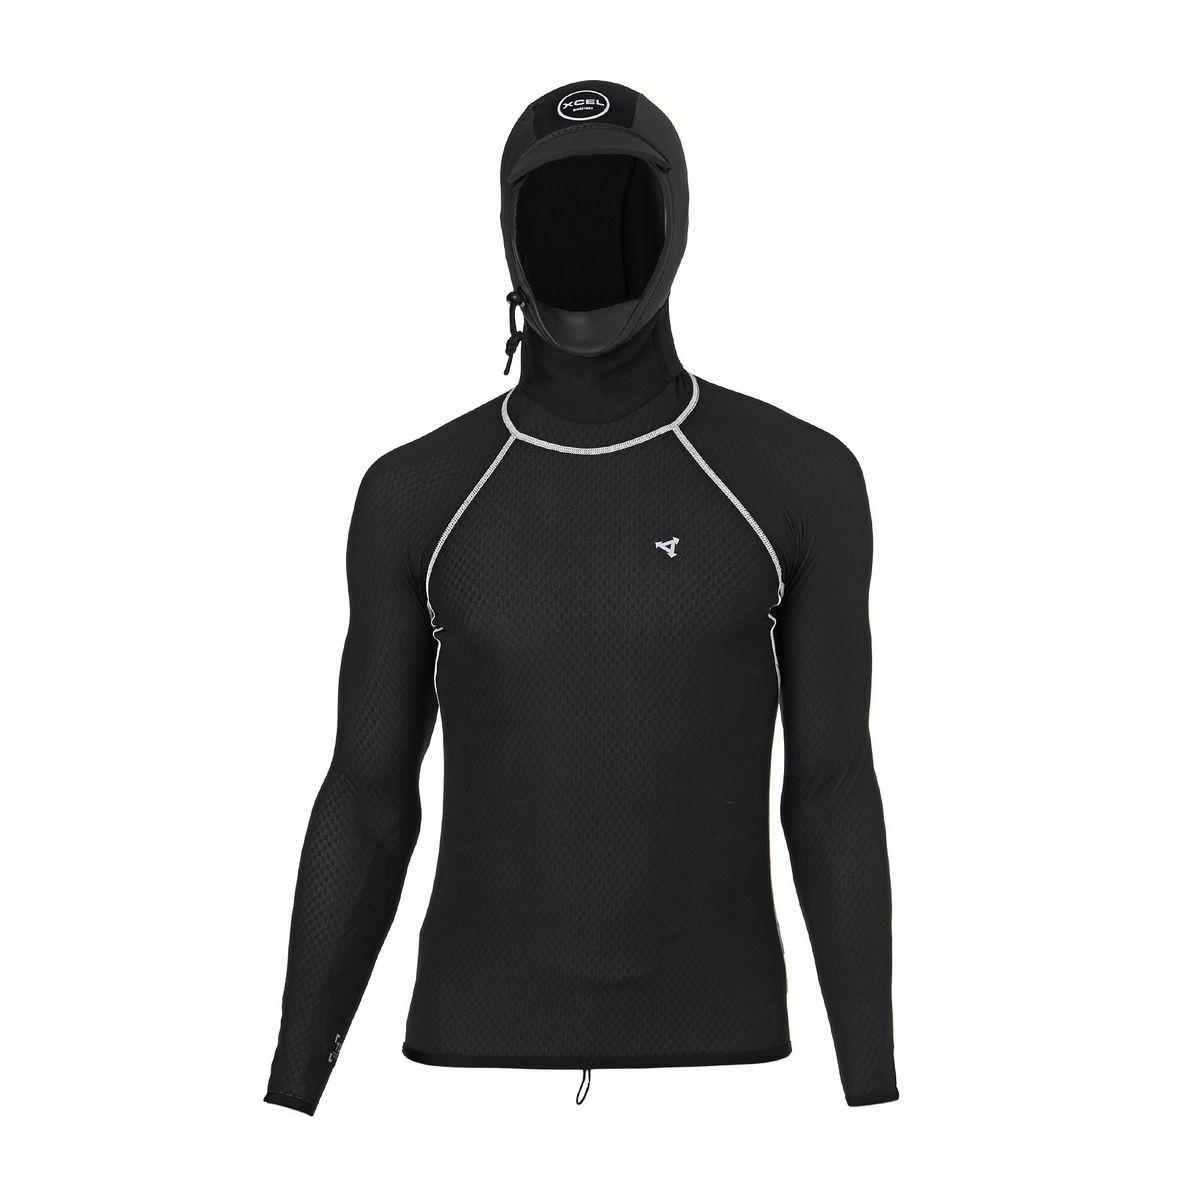 Xcel Celliant 2mm Hooded 2017 Long Sleeve Thermal Rash Vest - Black